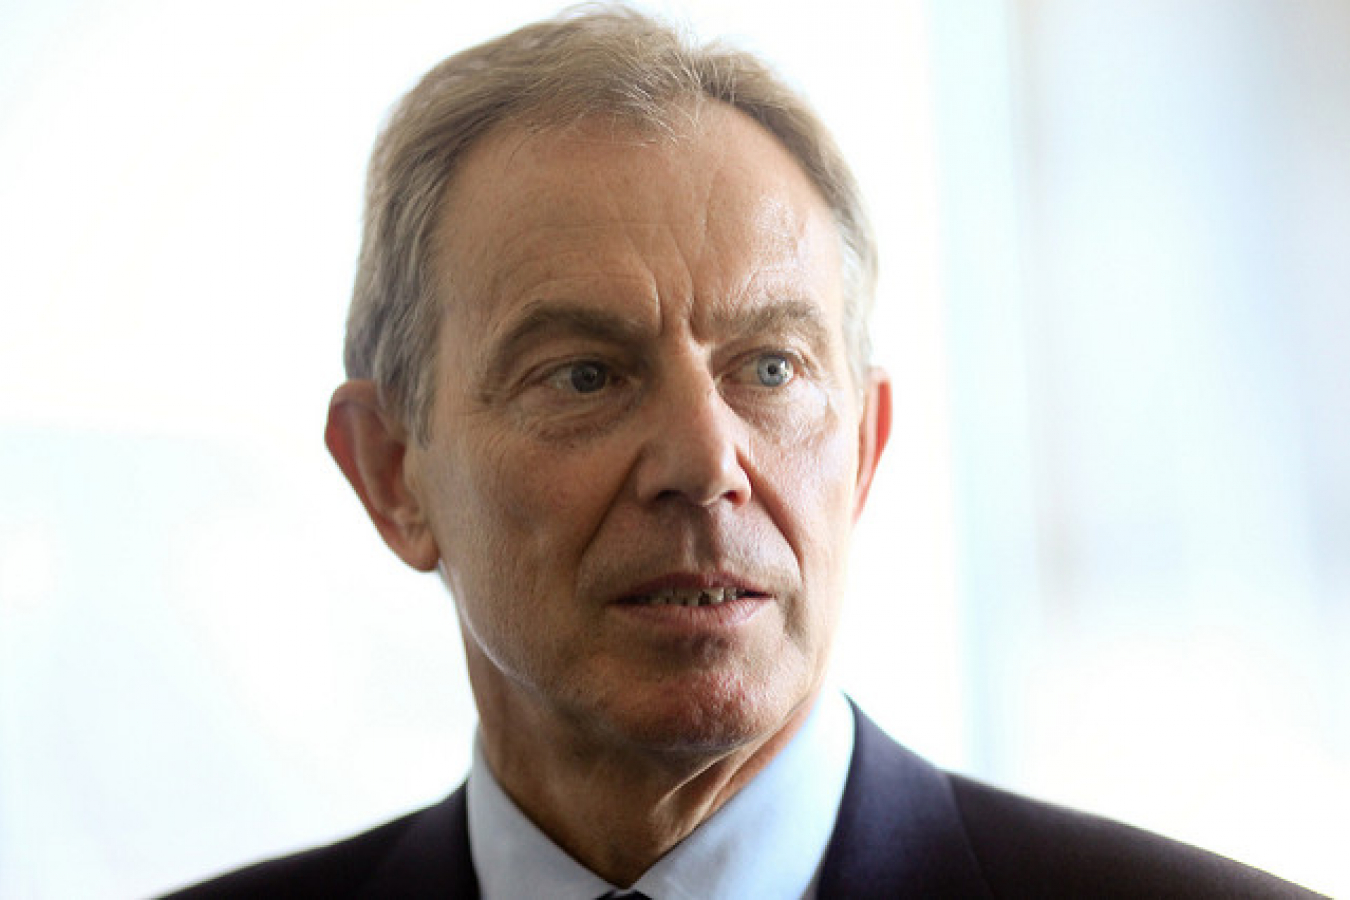 Former Labour Prime Minister Tony Blair introduced Tier 2 Visa System